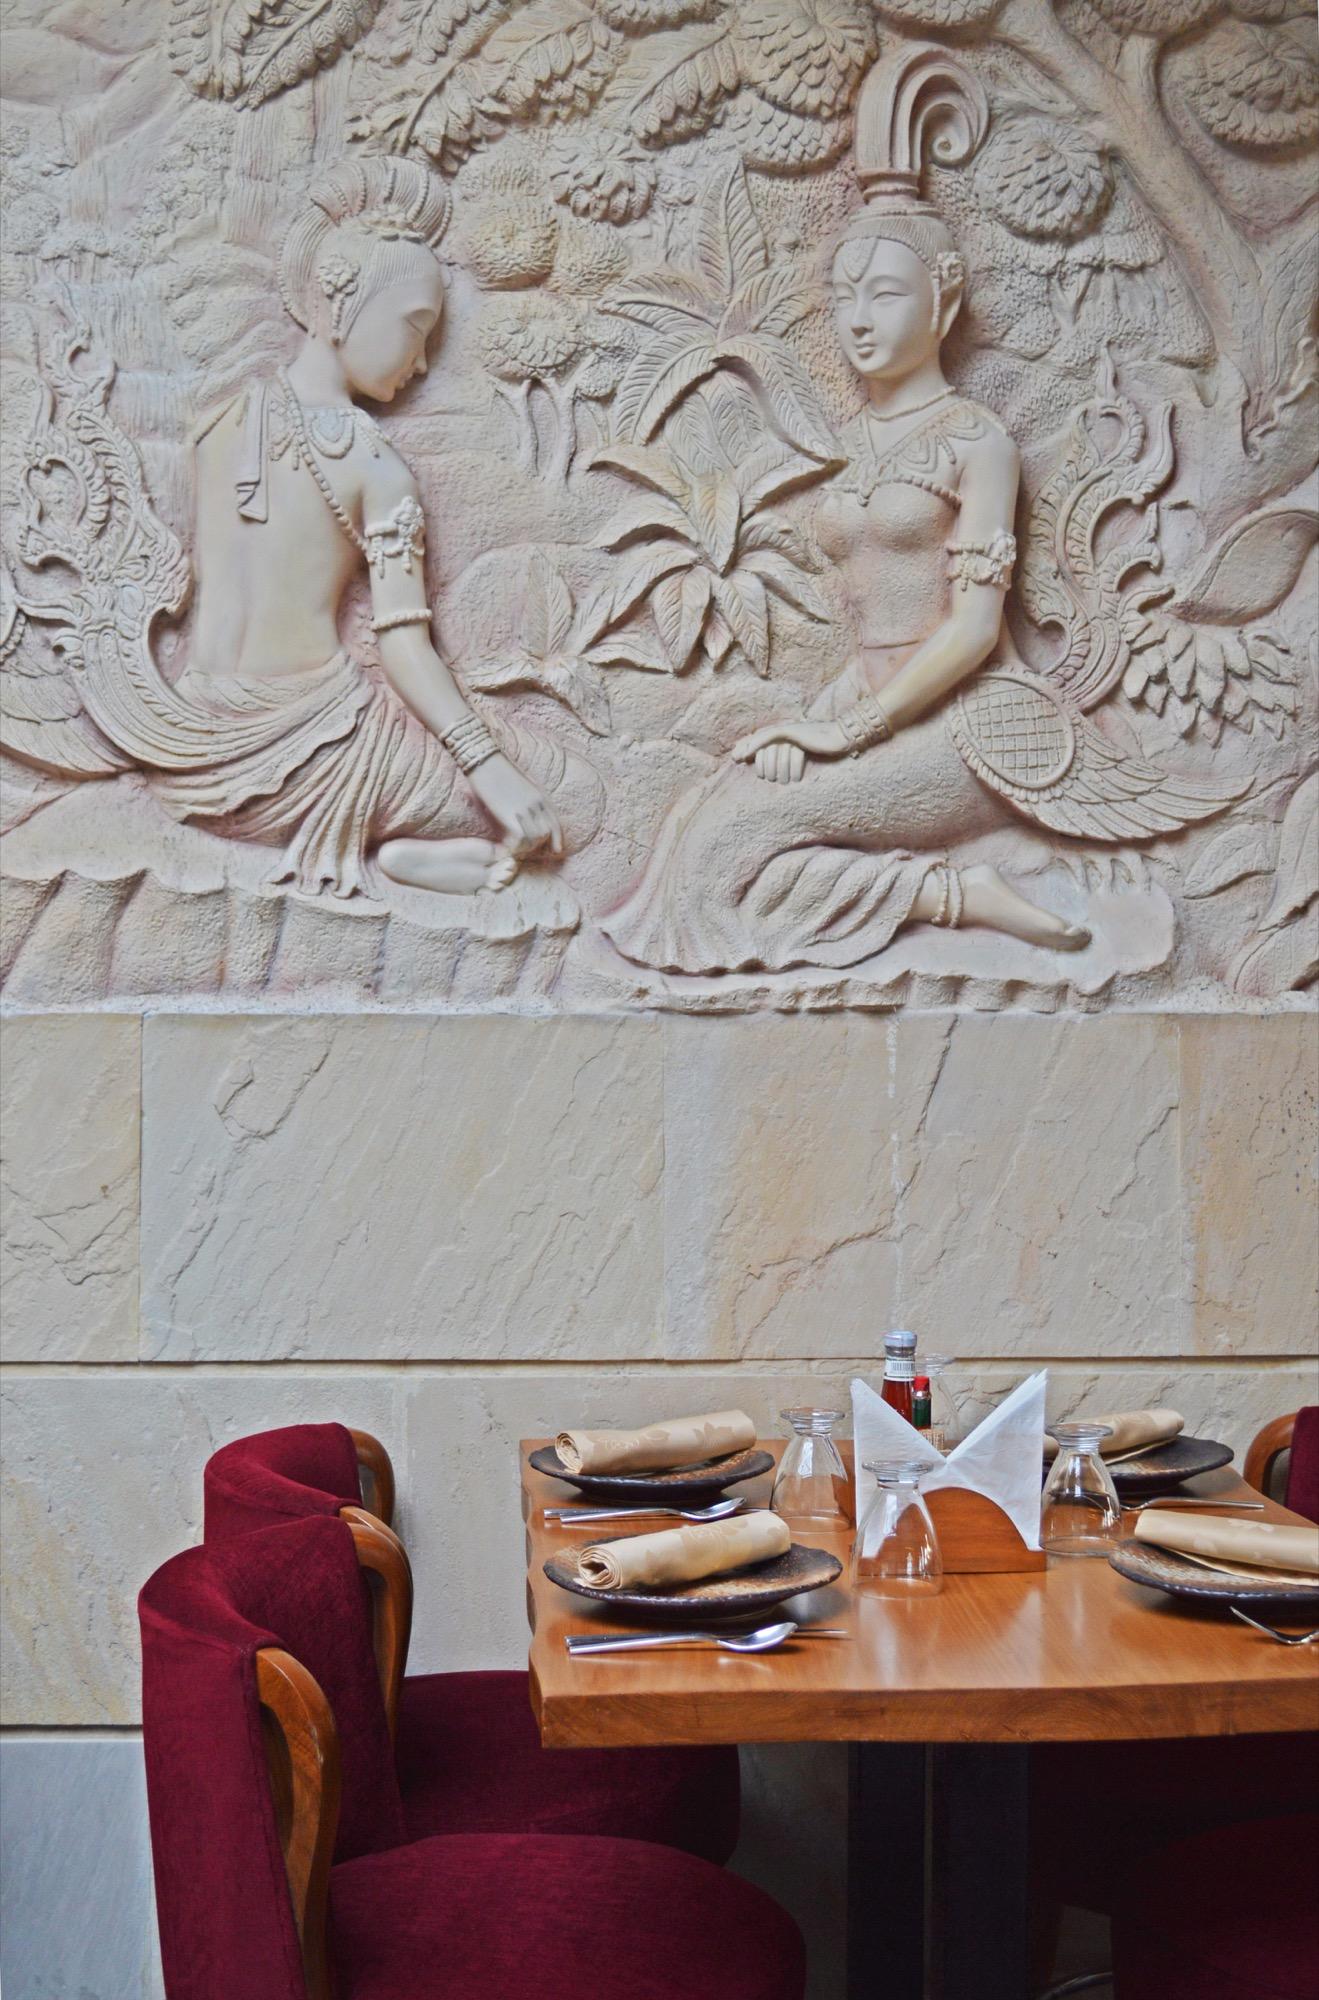 Best of Asia Village, Interior design for a restaurant at Delhi by Aspire Designs 17